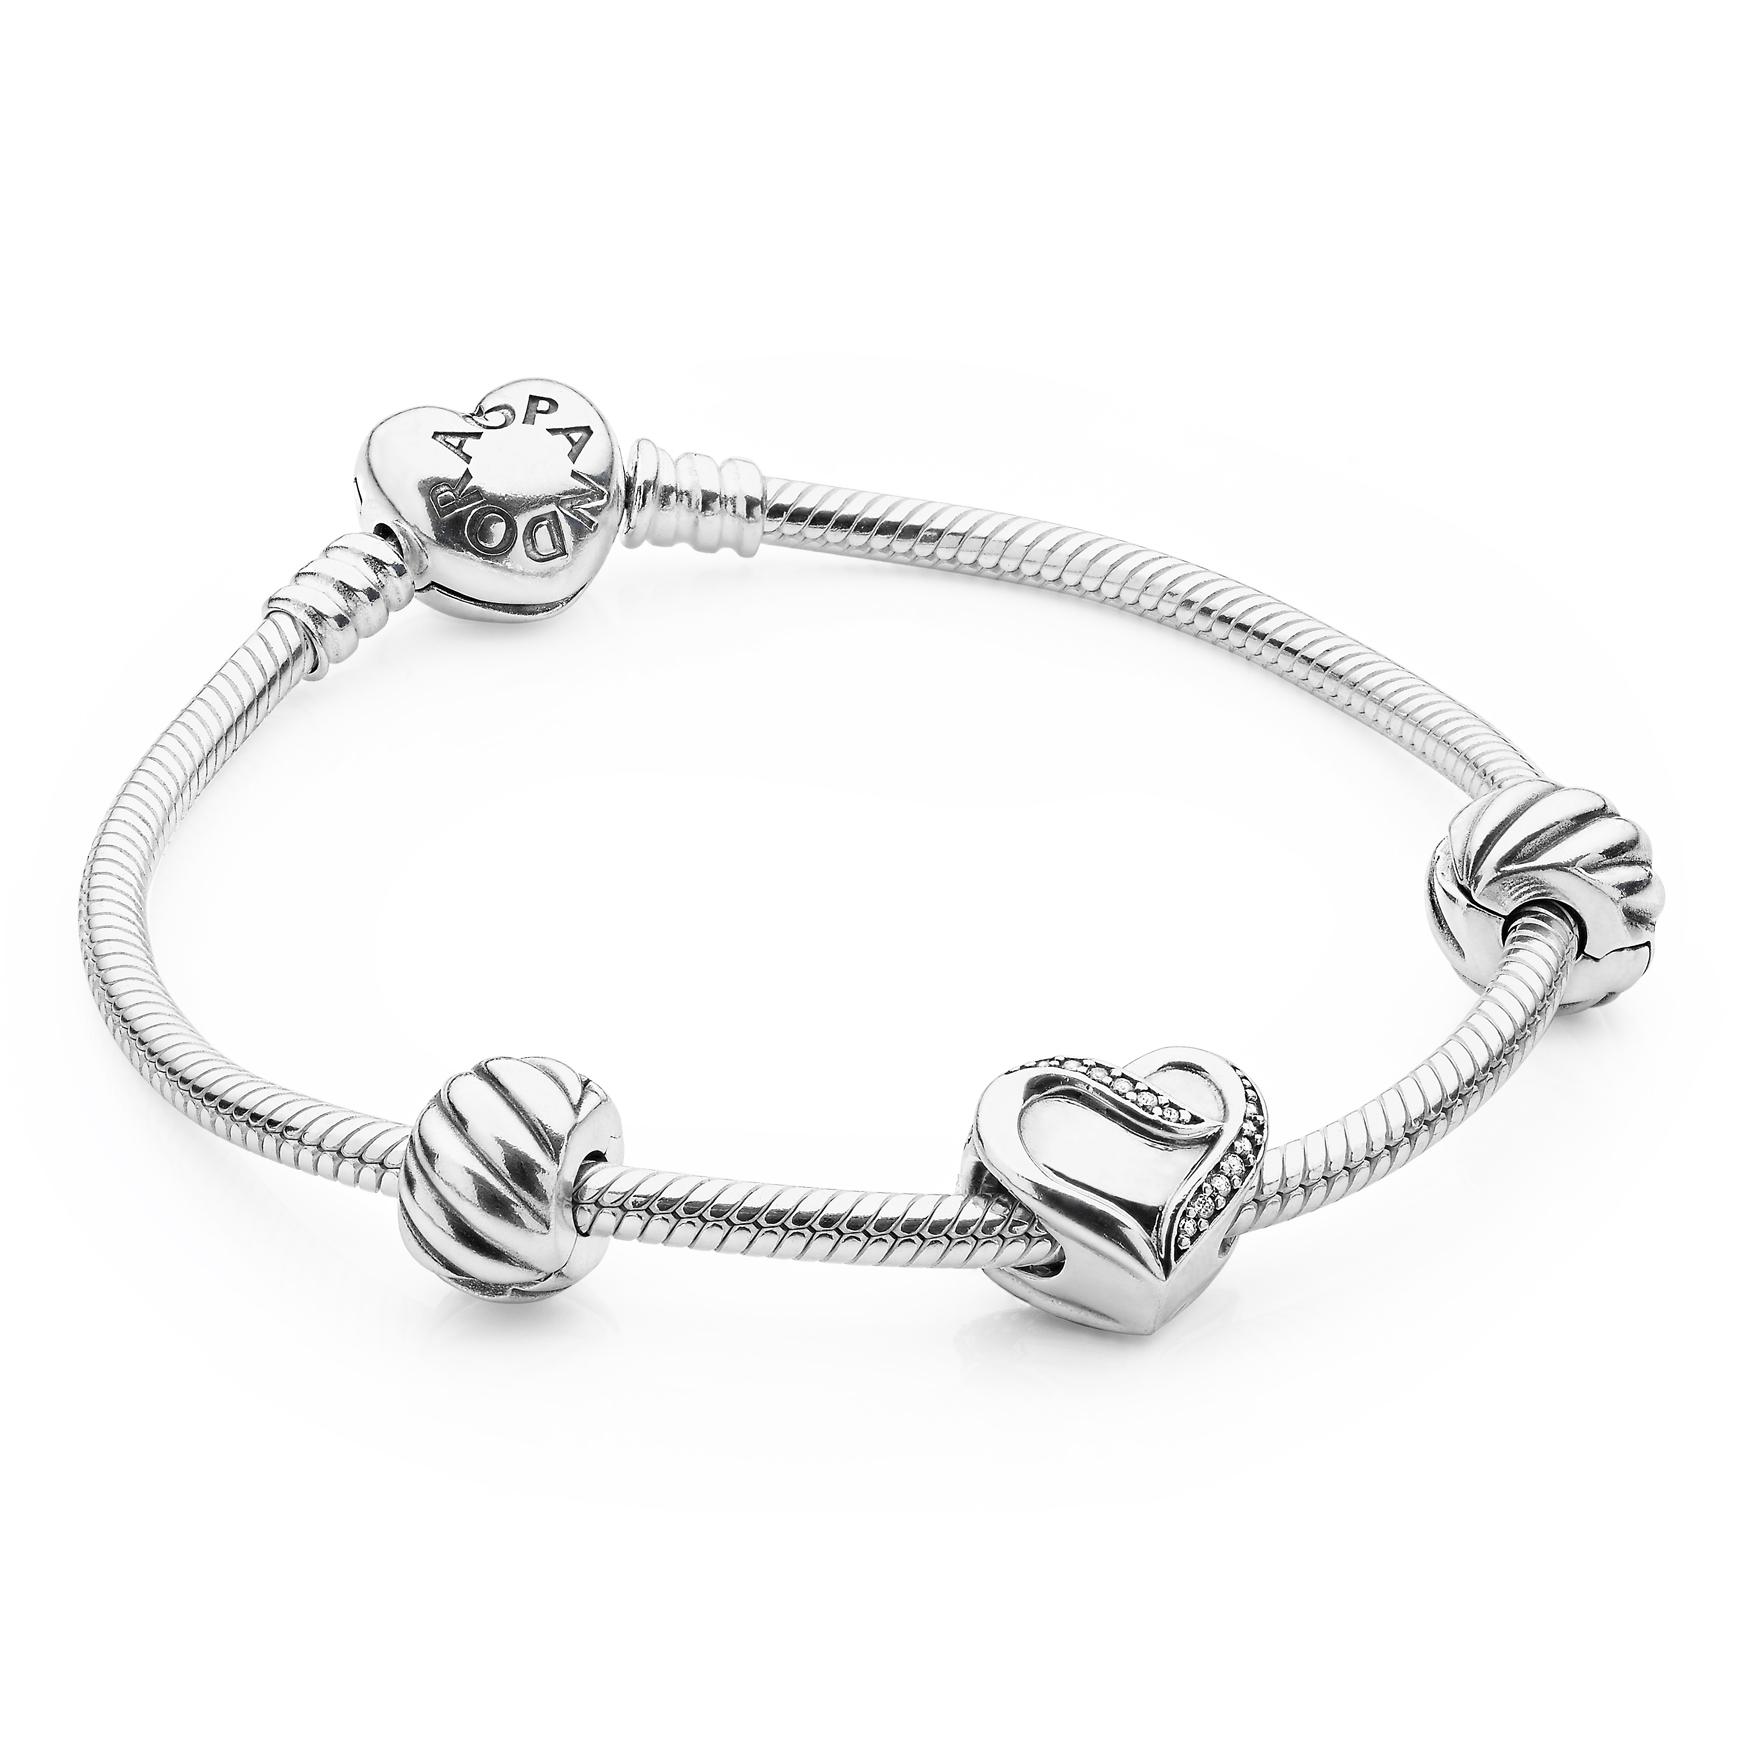 Jewelry Stores That Sell Pandora Bracelets: Pandora Charm Sets ,stores That Sell Pandora Jewelry